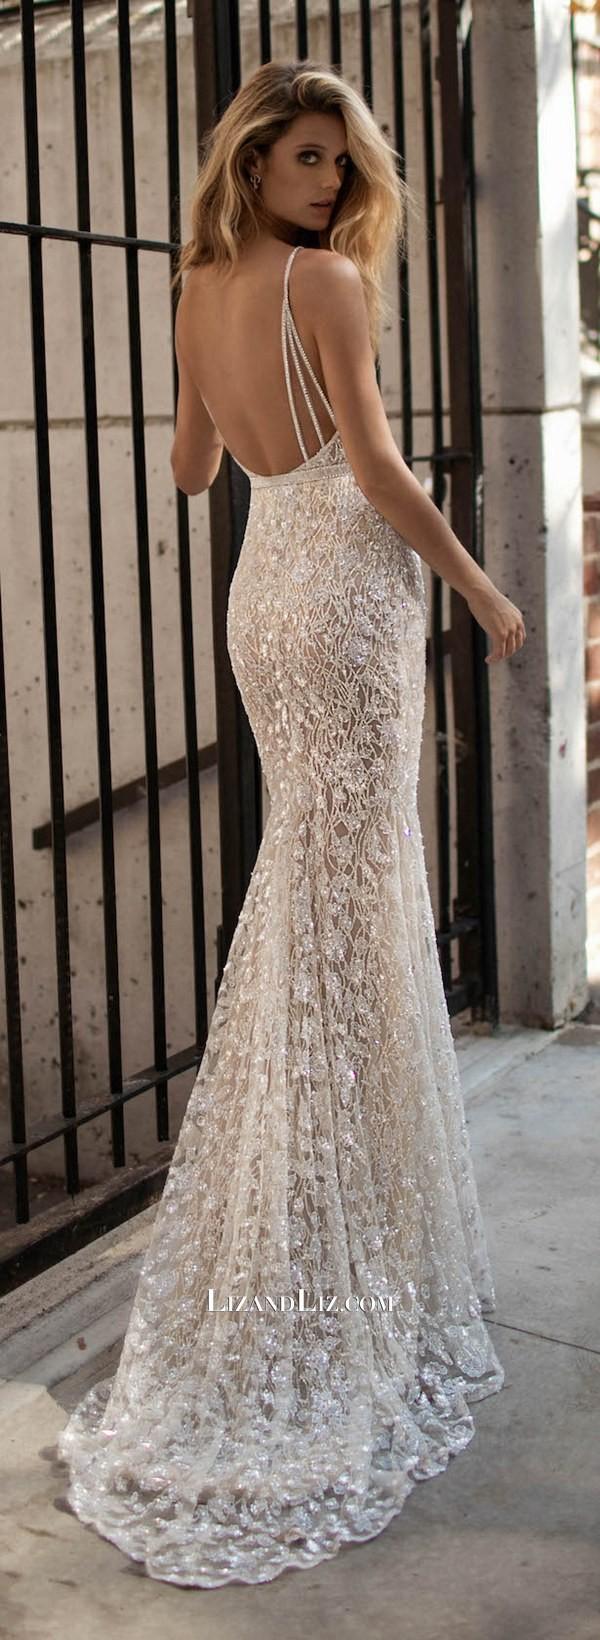 beautiful sparkly wedding dresses photo - 1